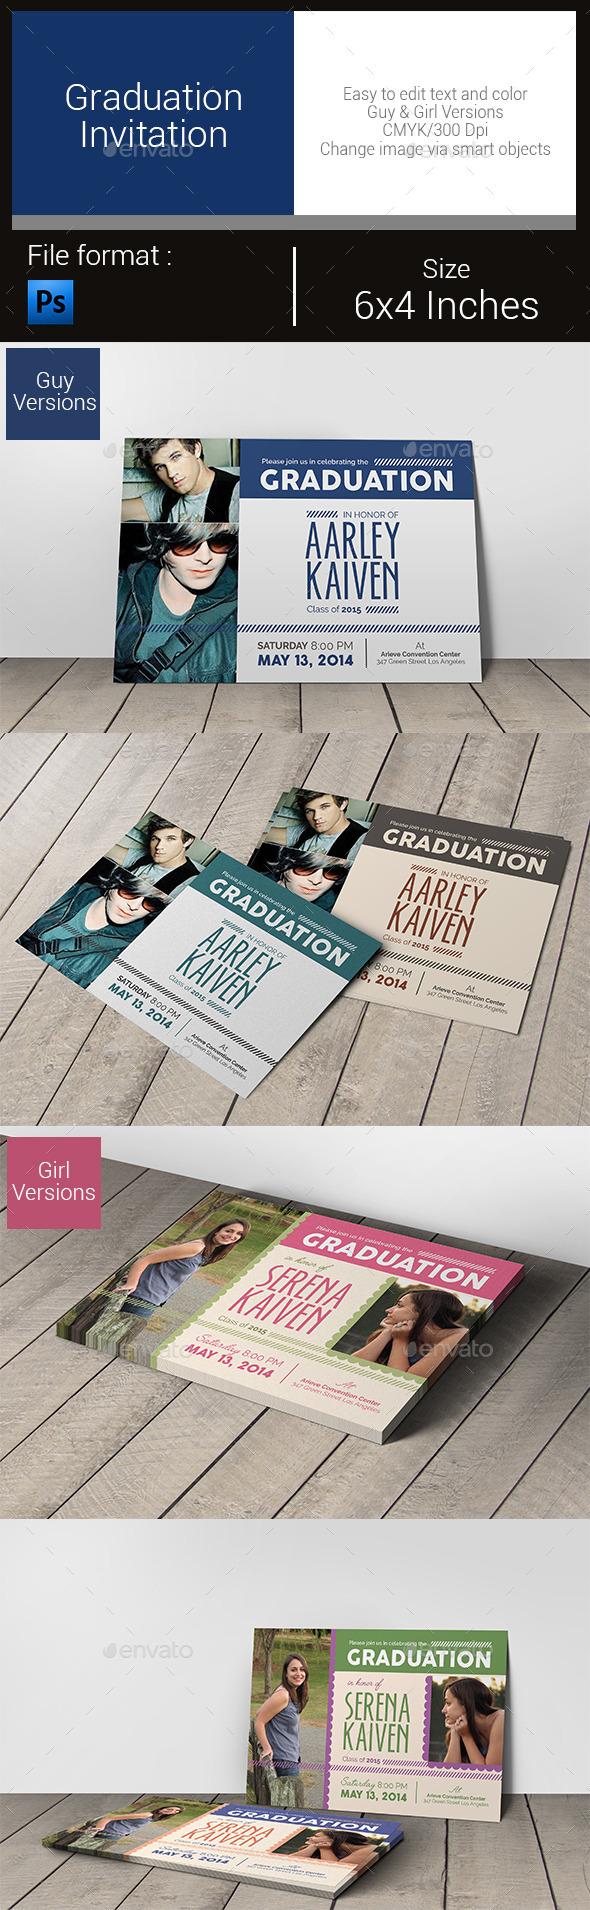 Graduation Invitation - Invitations Cards & Invites